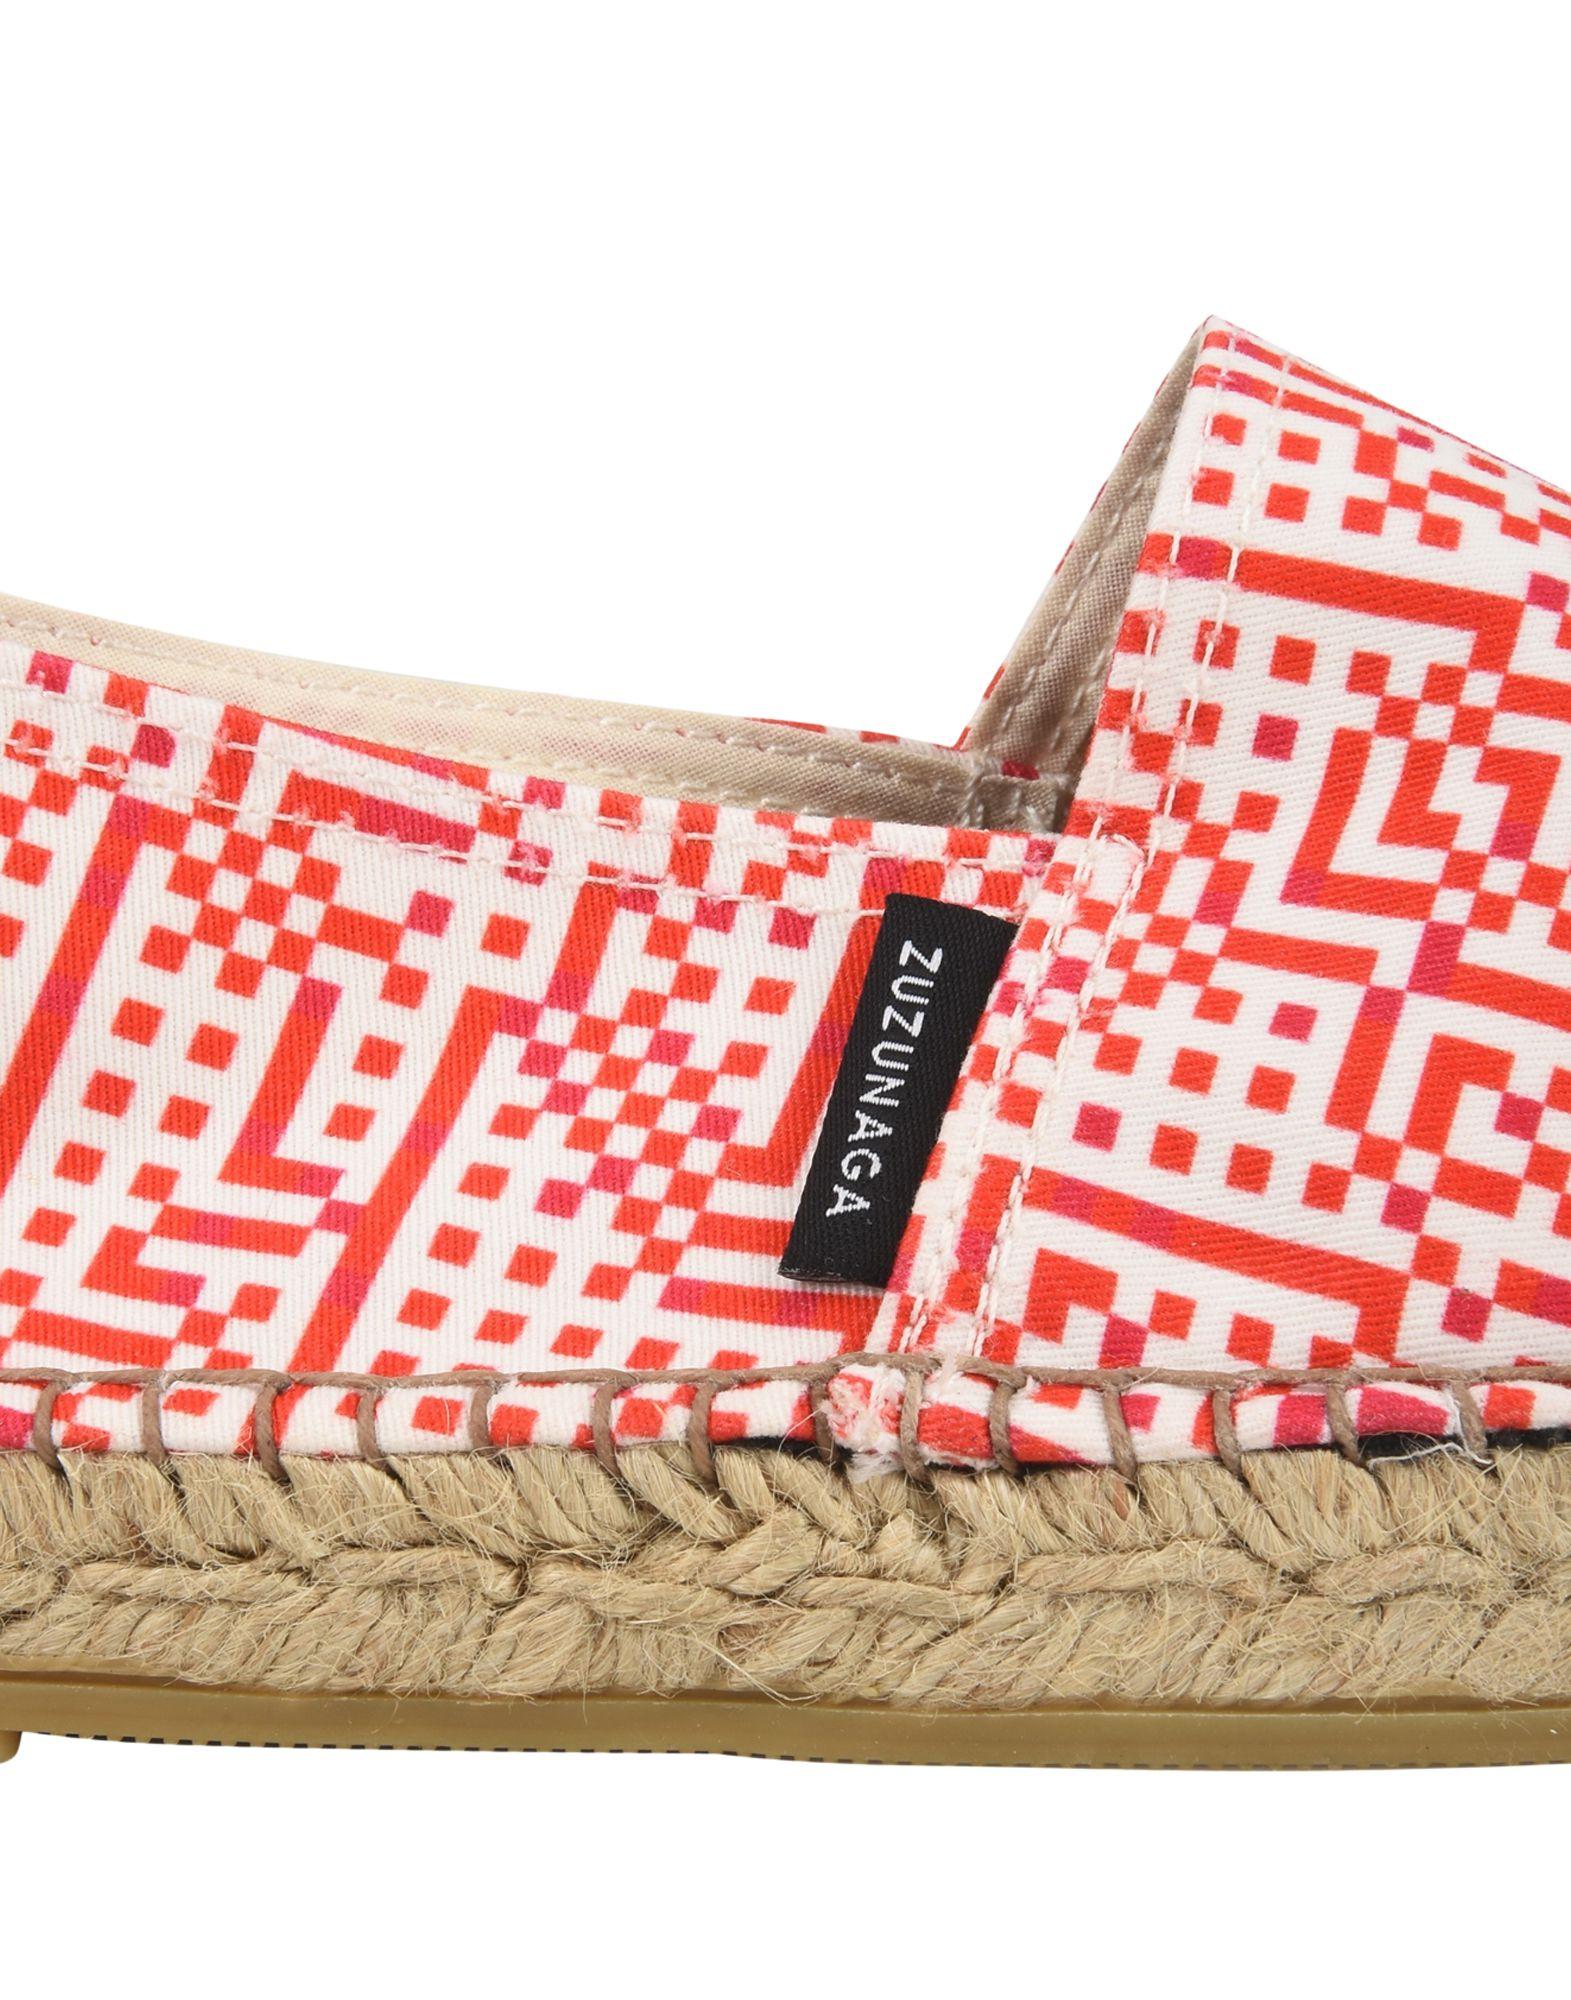 Chaussures - Espadrilles Zuzunaga HPCidI9L2d